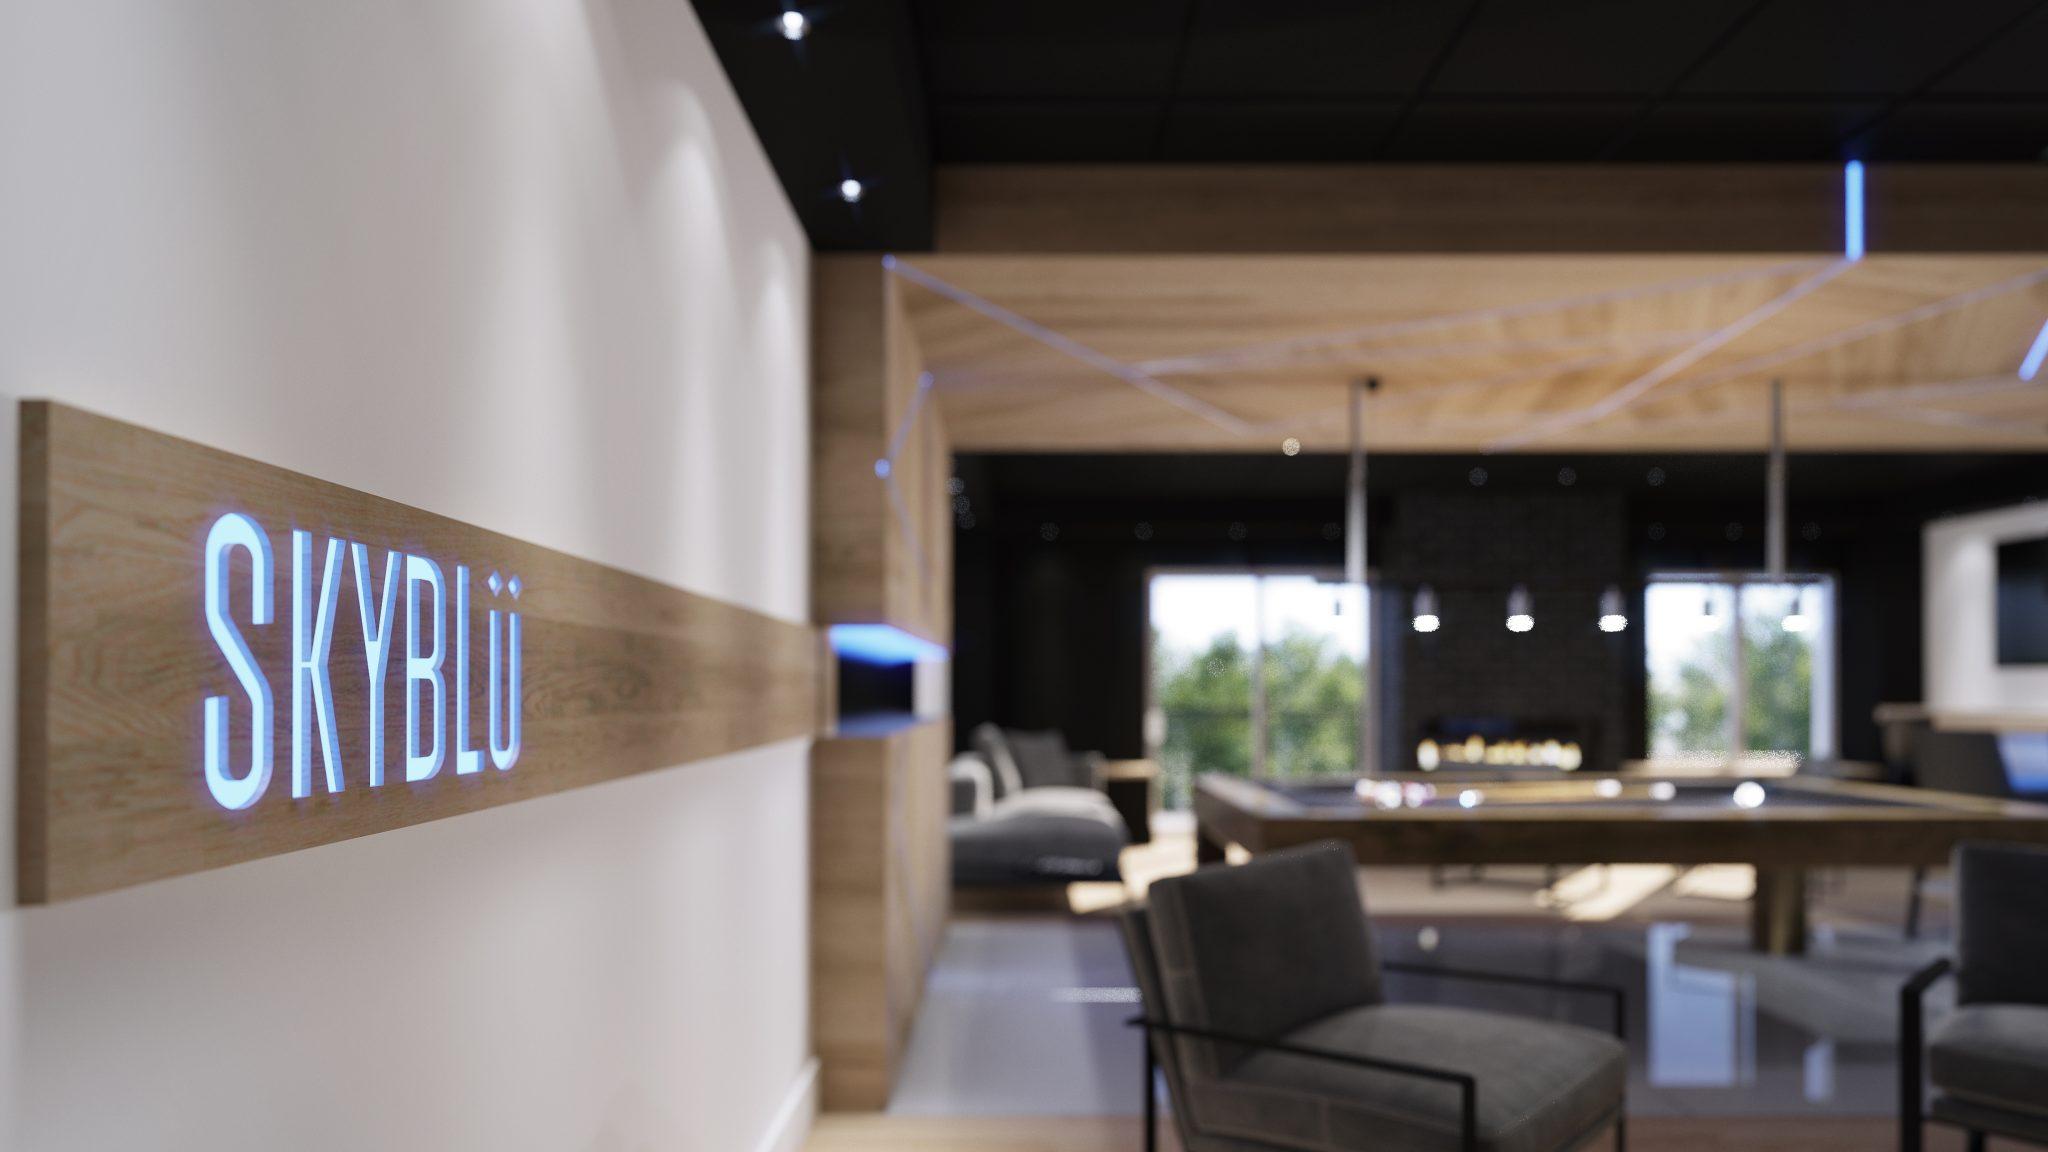 Lounge - Condos neufs a vendre a Mirabel